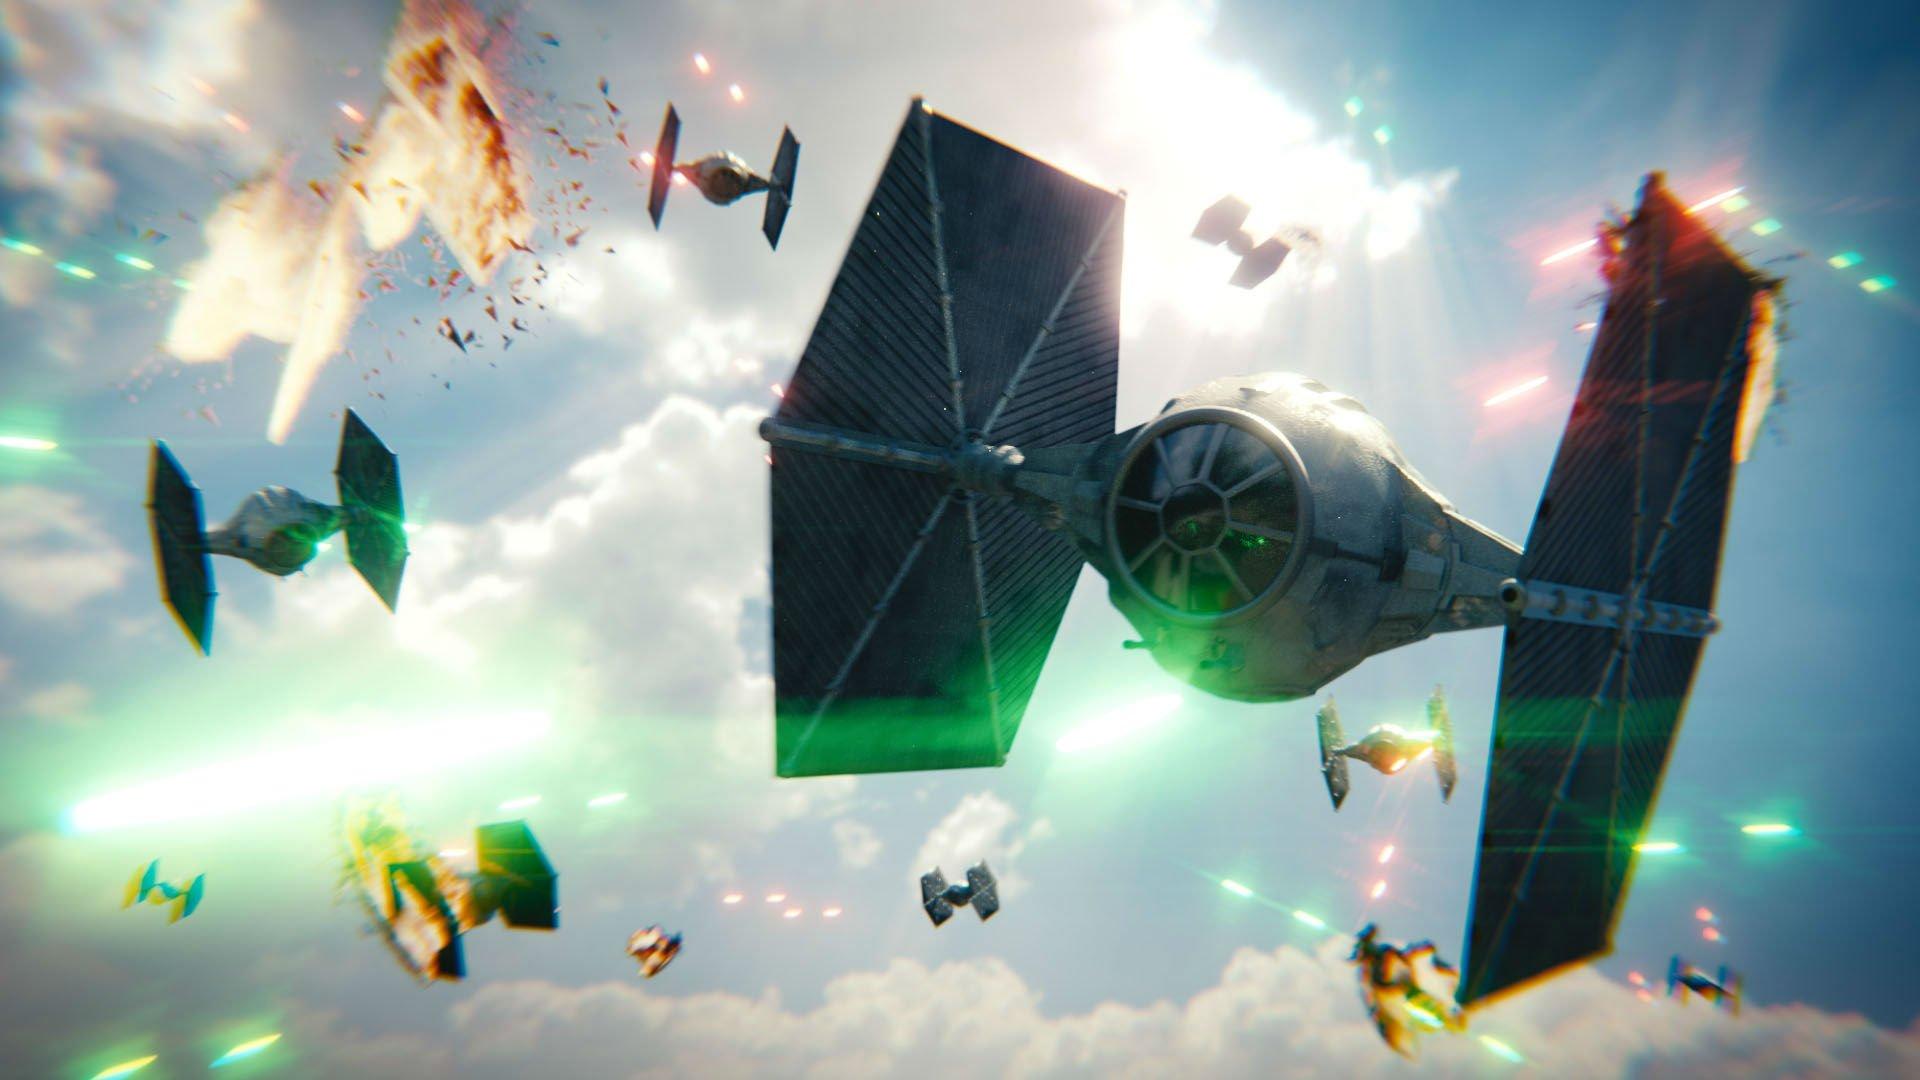 Tie Fighter Star Wars Futuristic Spaceship Space Sci Fi Wallpaper 1920x1080 811231 Wallpaperup